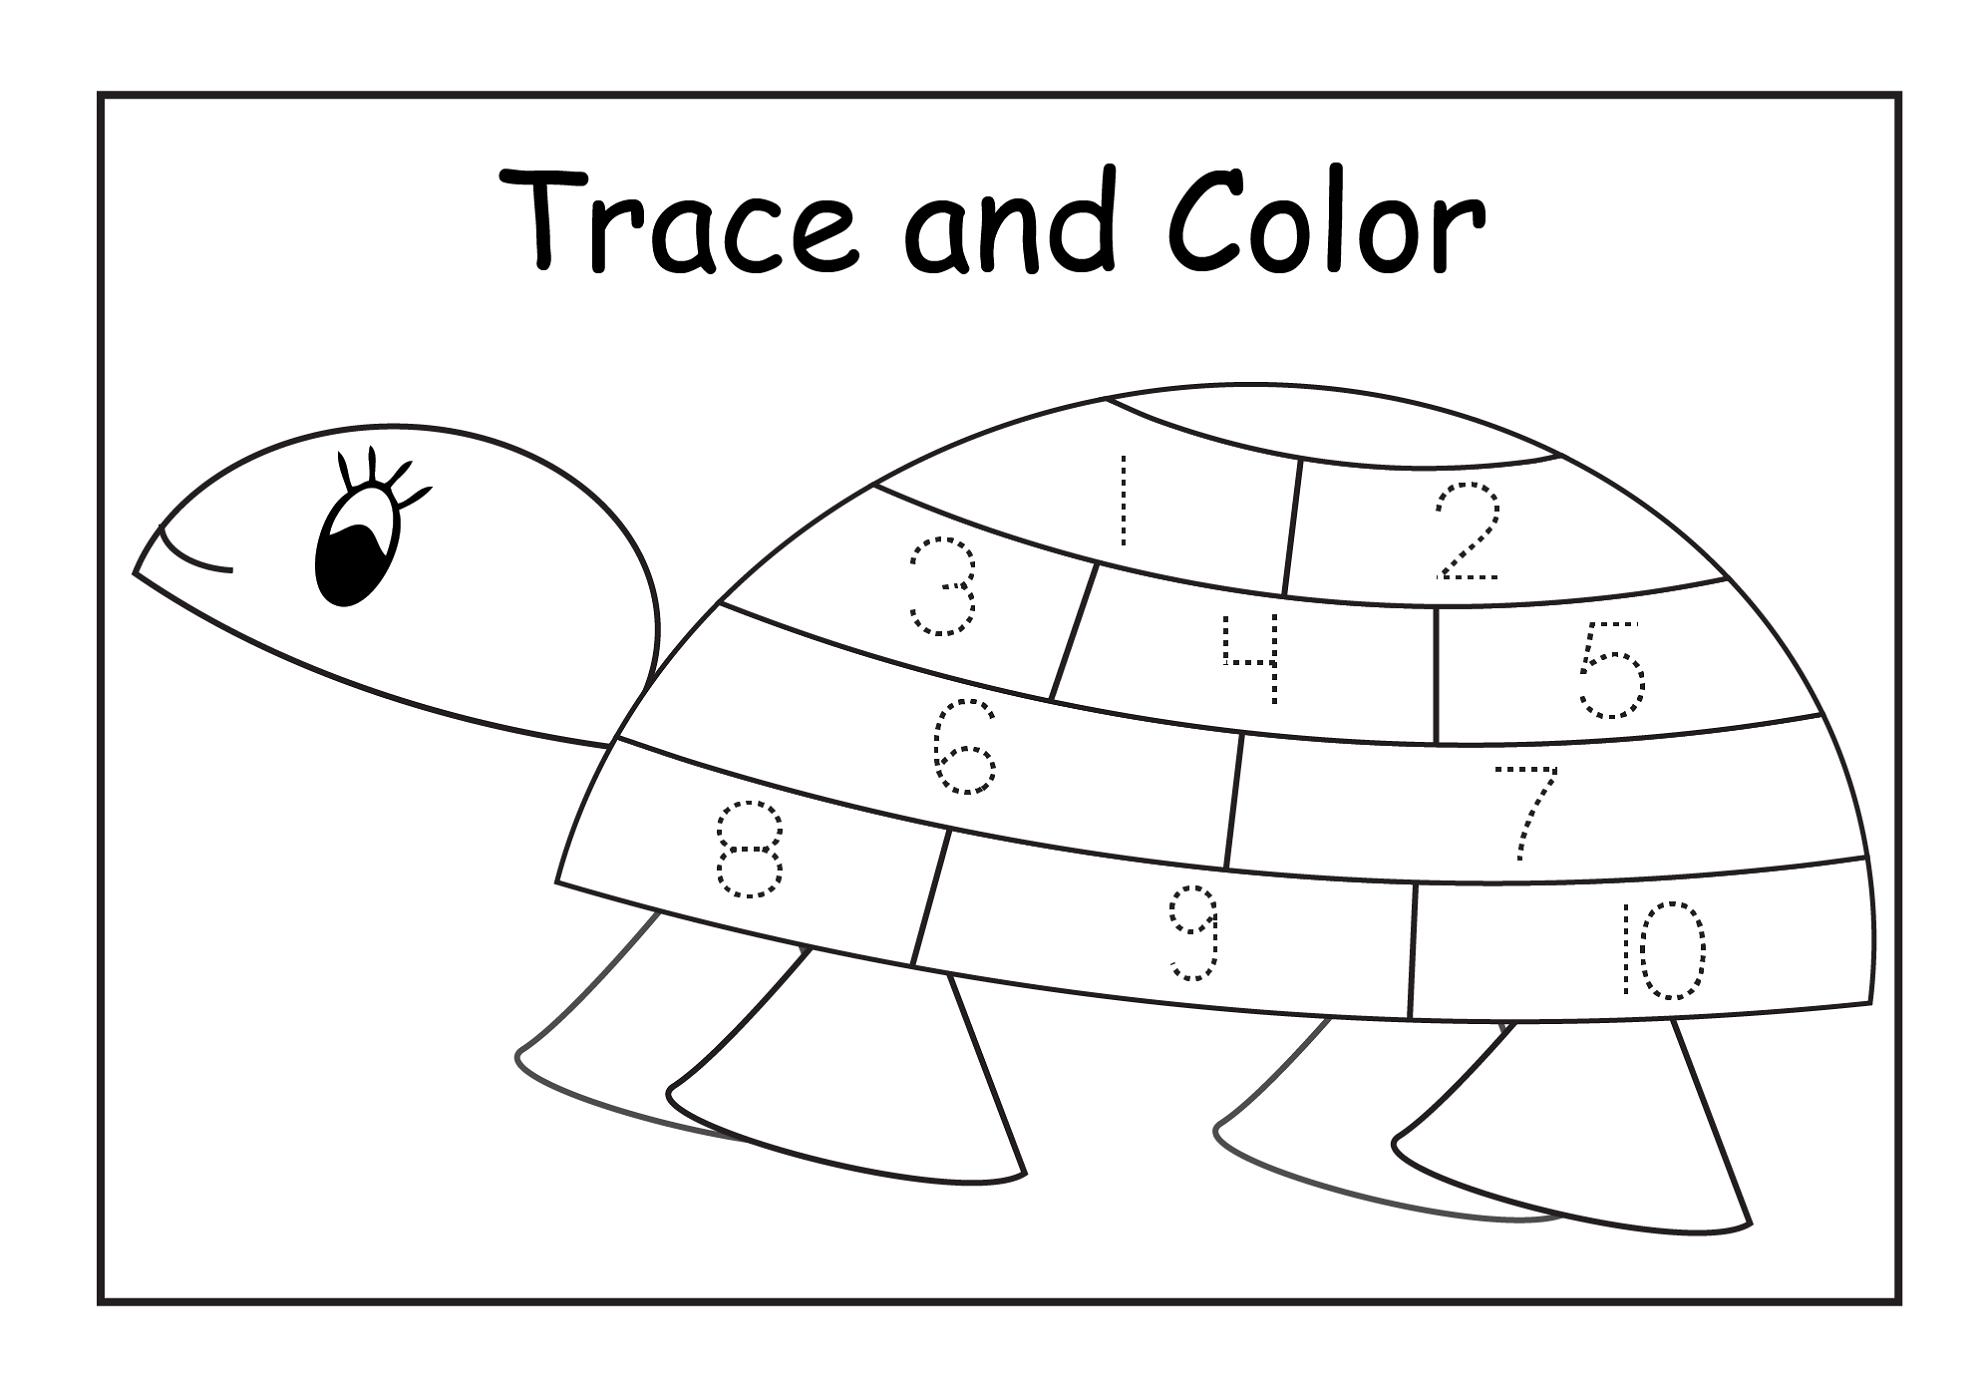 Number Tracer Pages for Kids | Activity Shelter